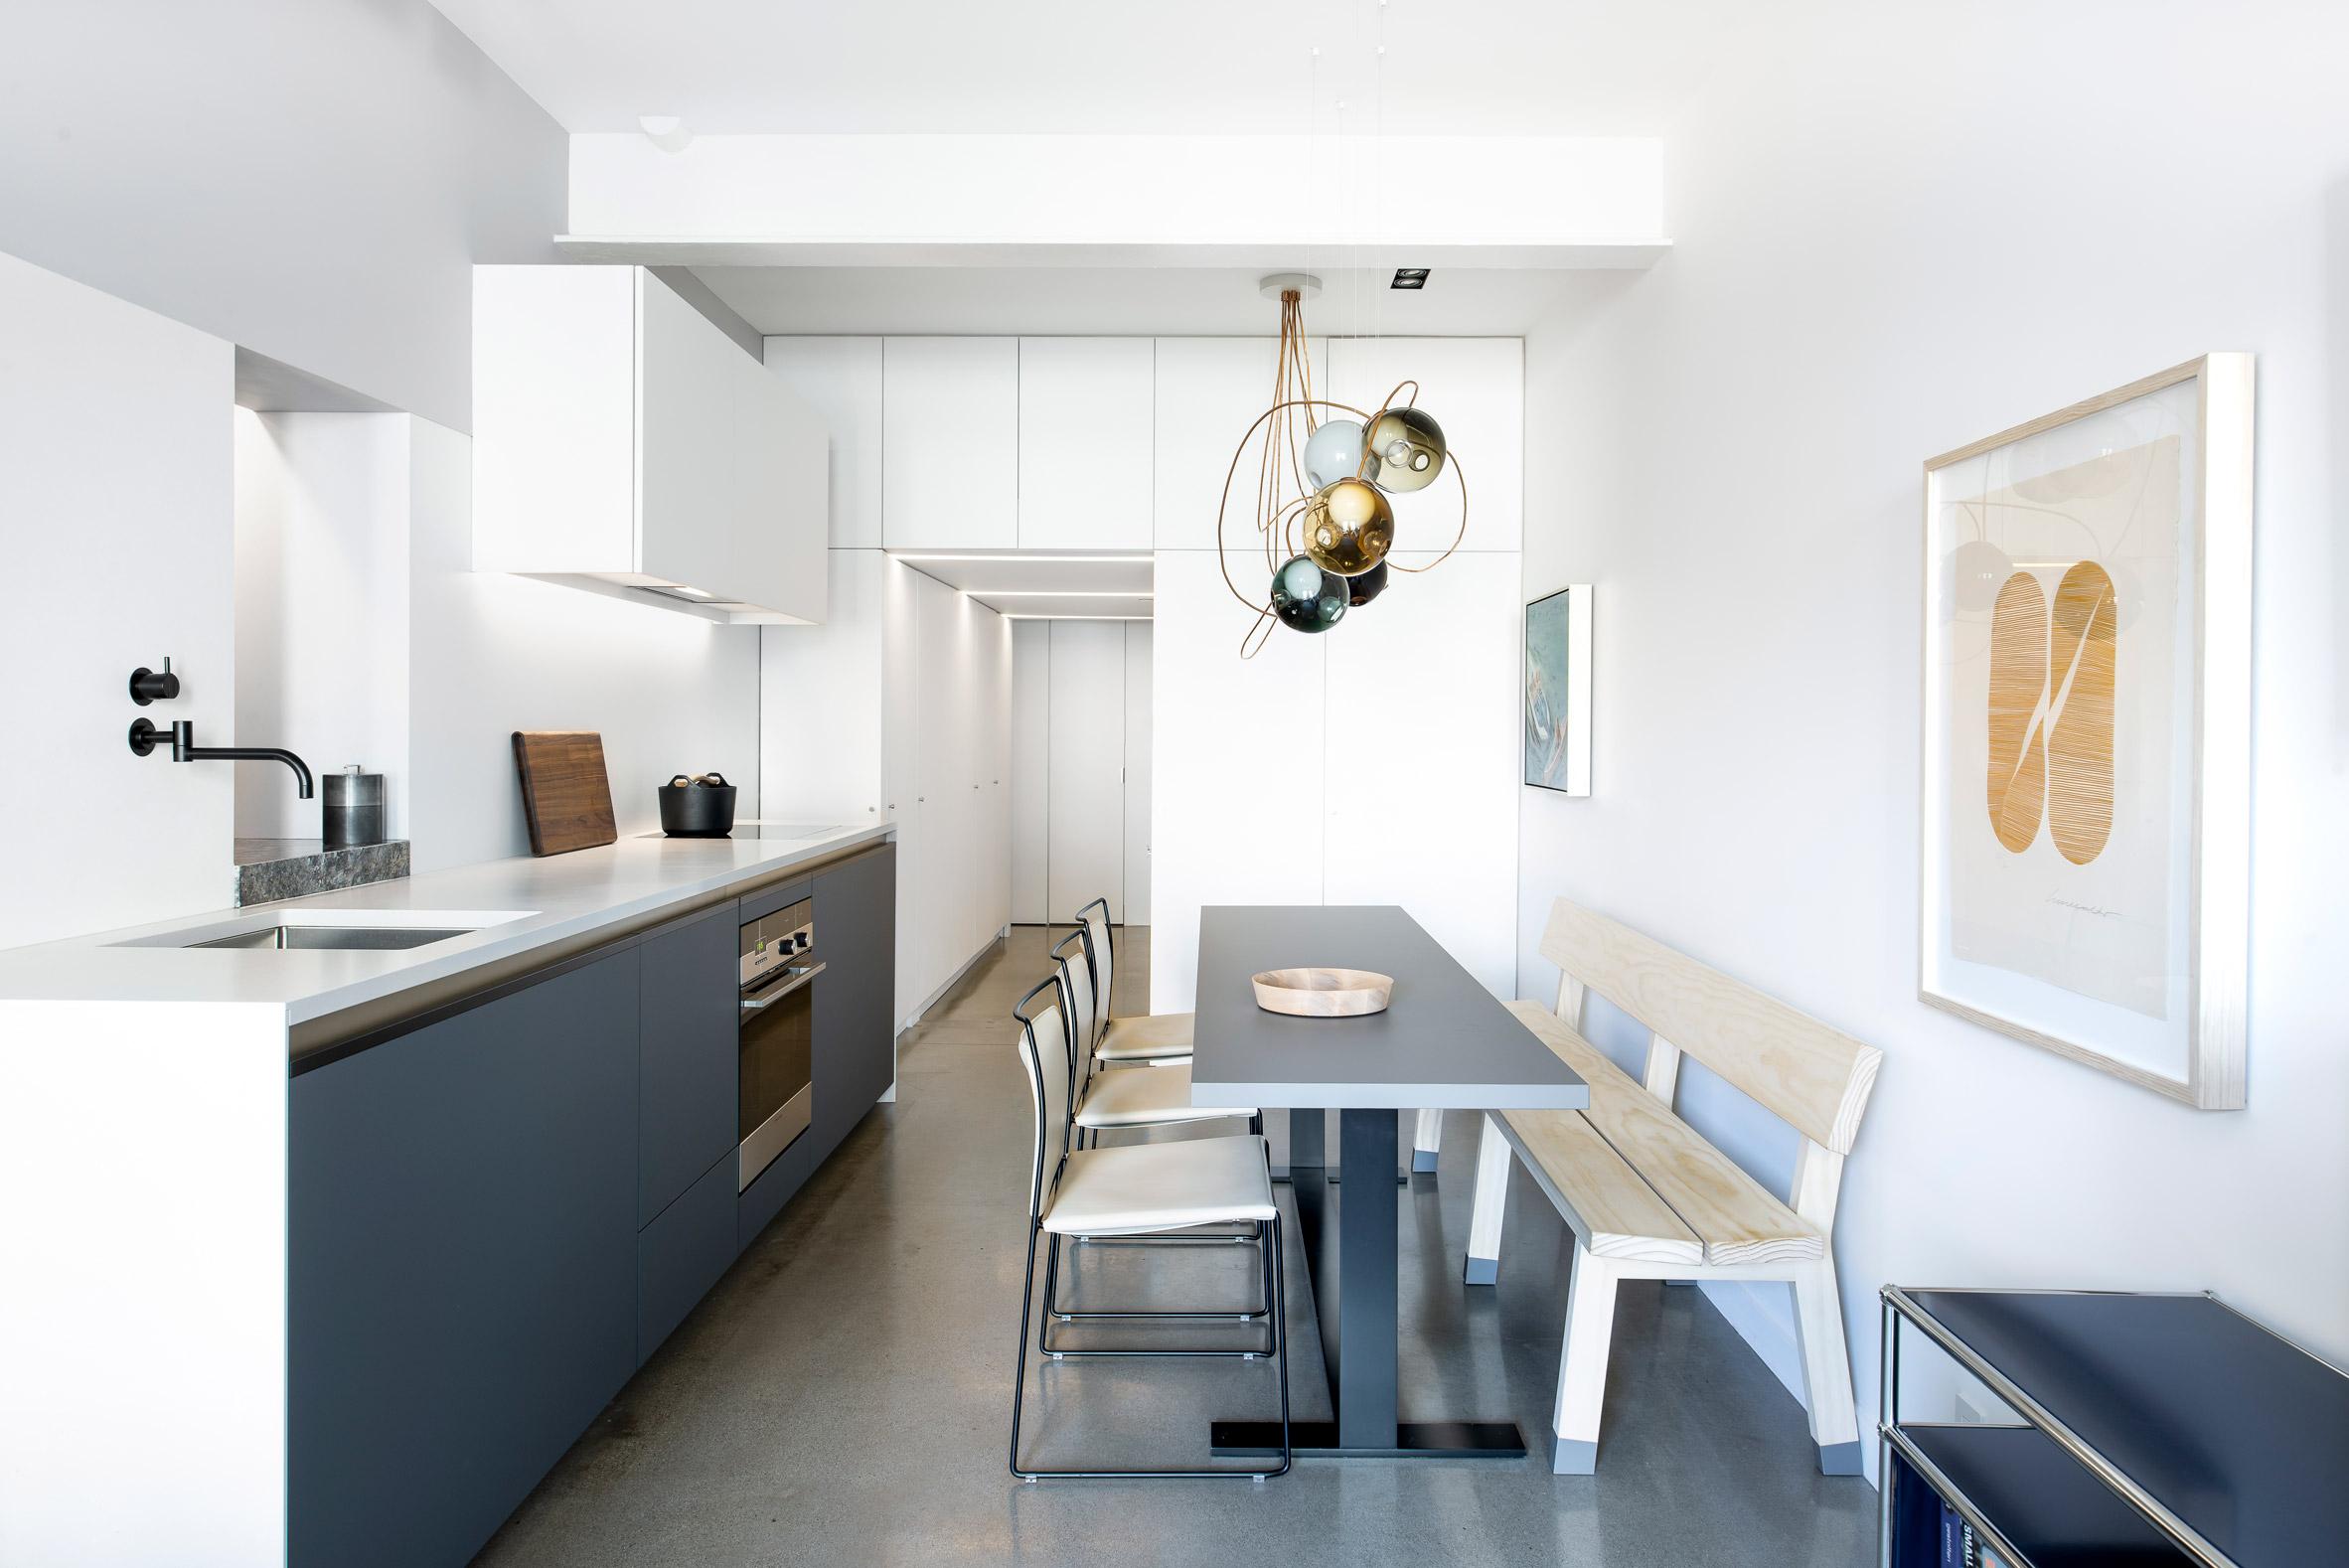 Vancouver loft renovation inspired by igloo by Falken Reynolds